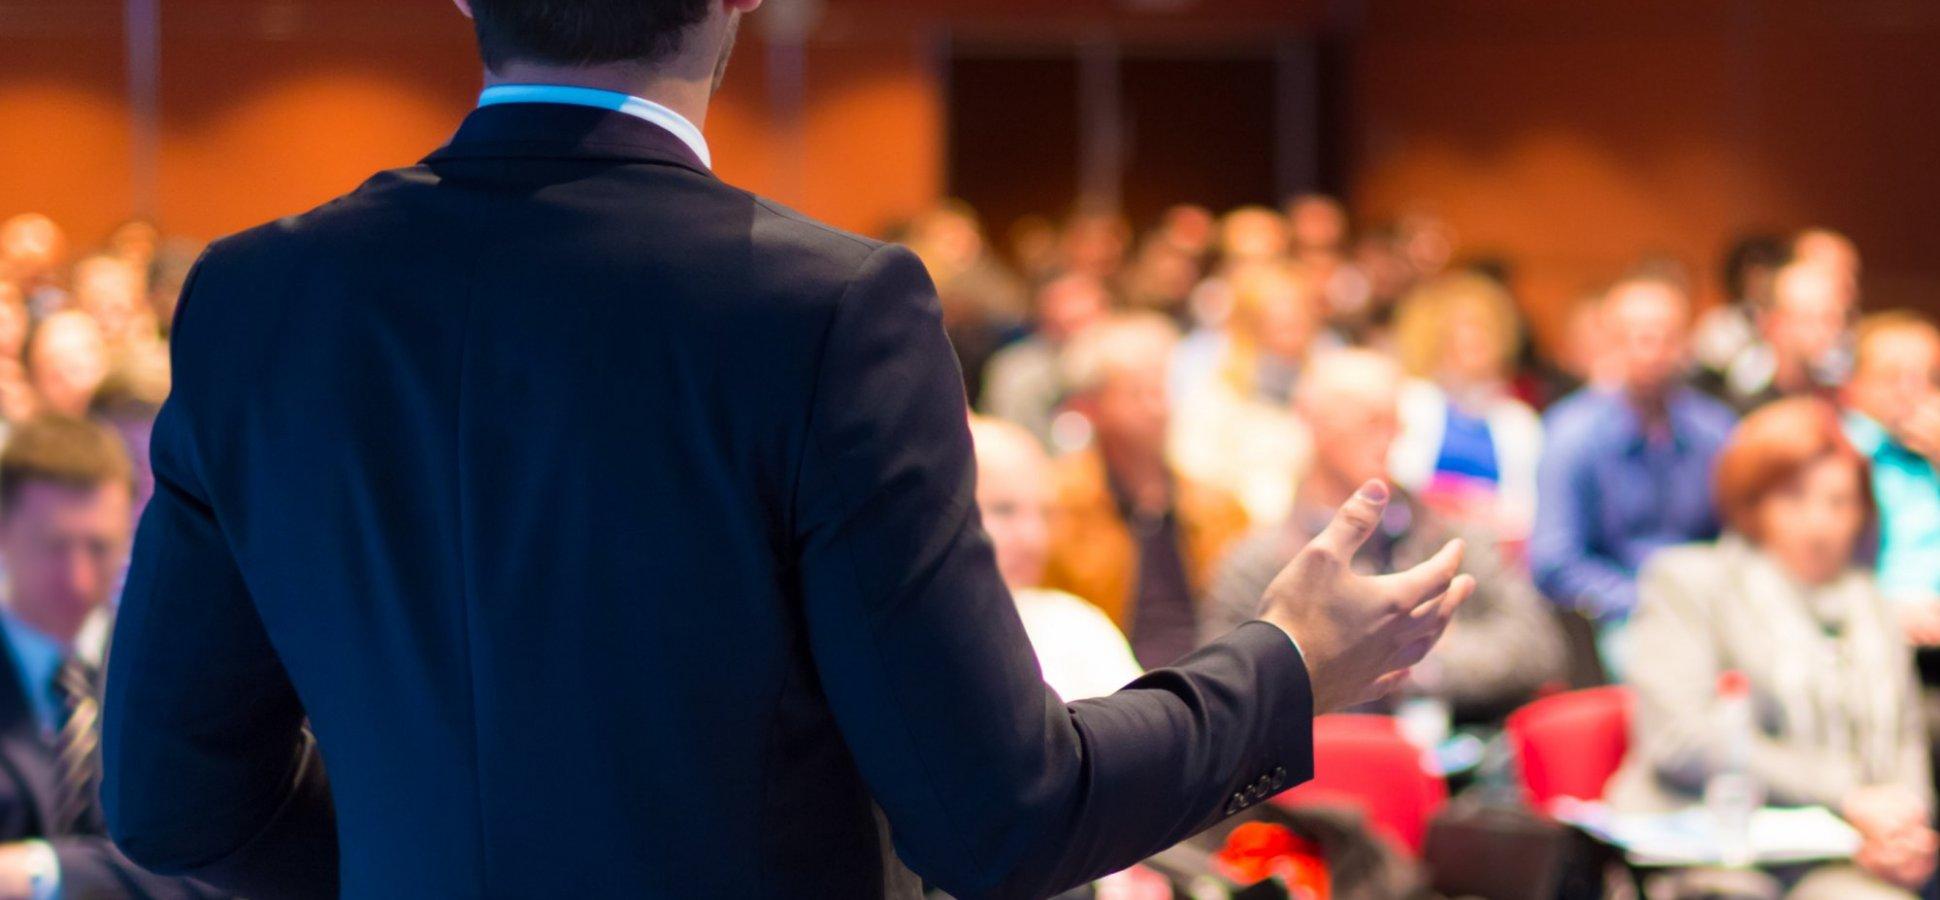 The Secret of a Great Presentation